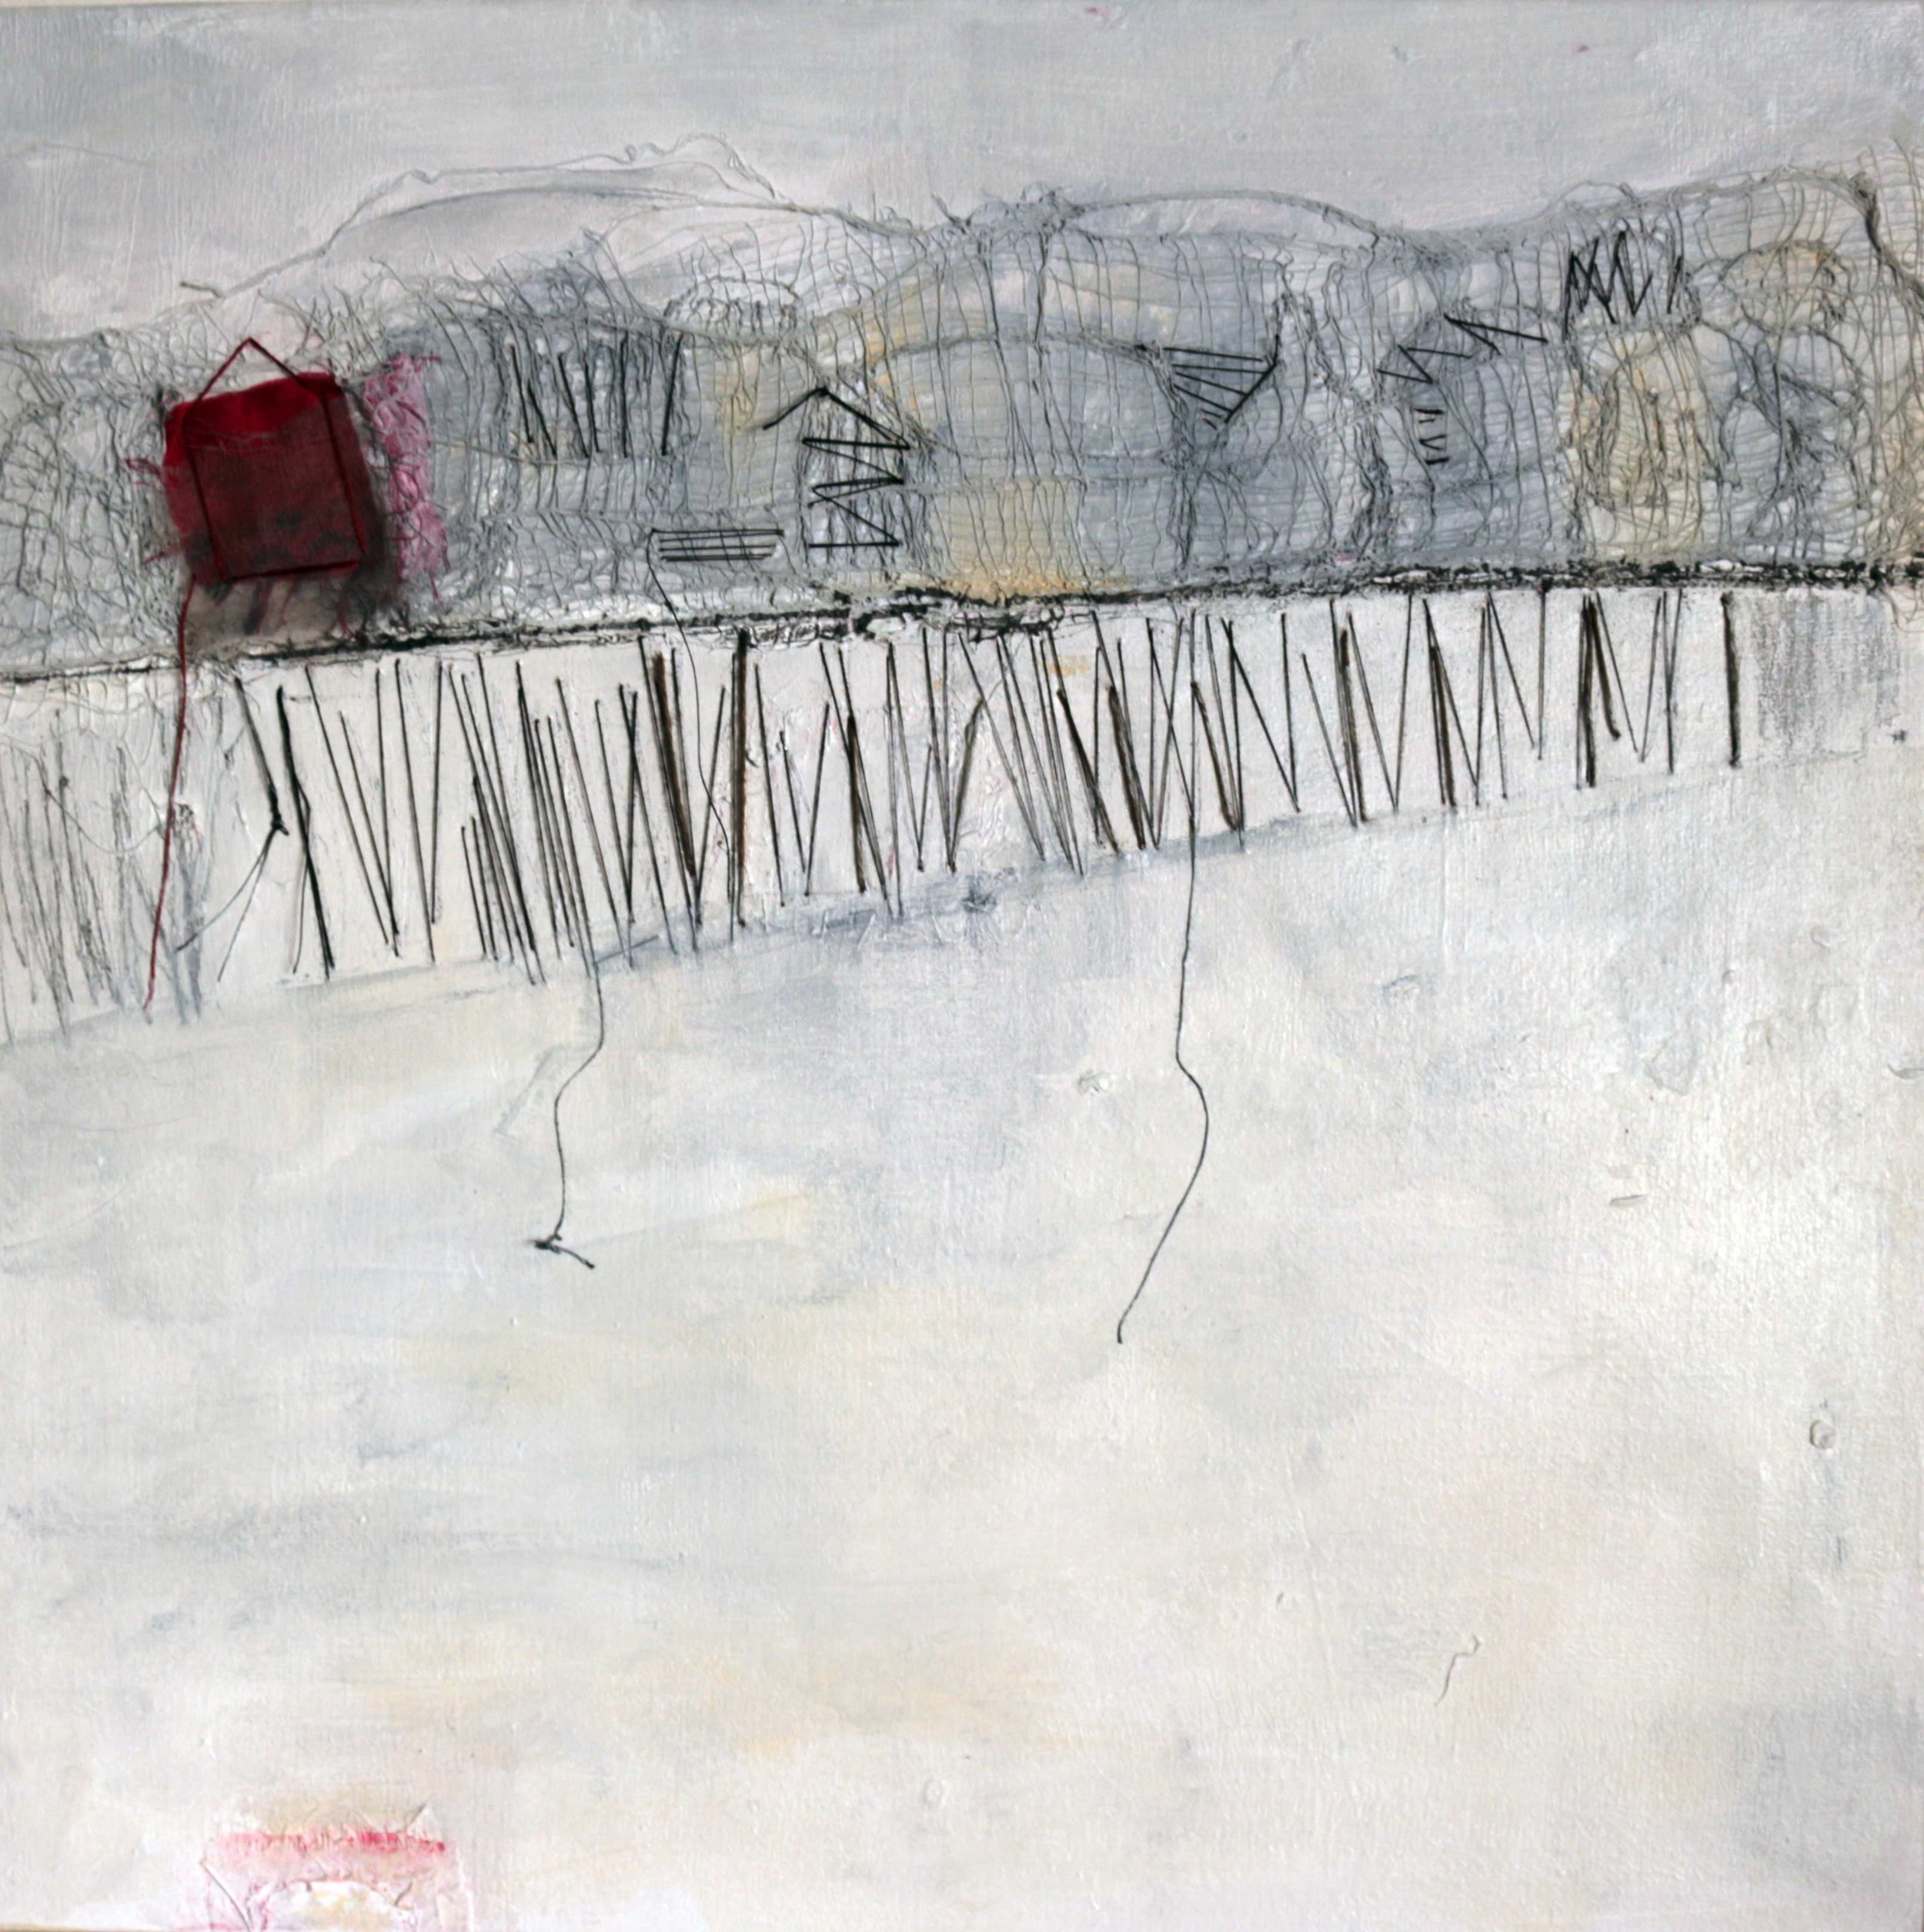 Liz Green, Tangled Web, 2016. © the artist